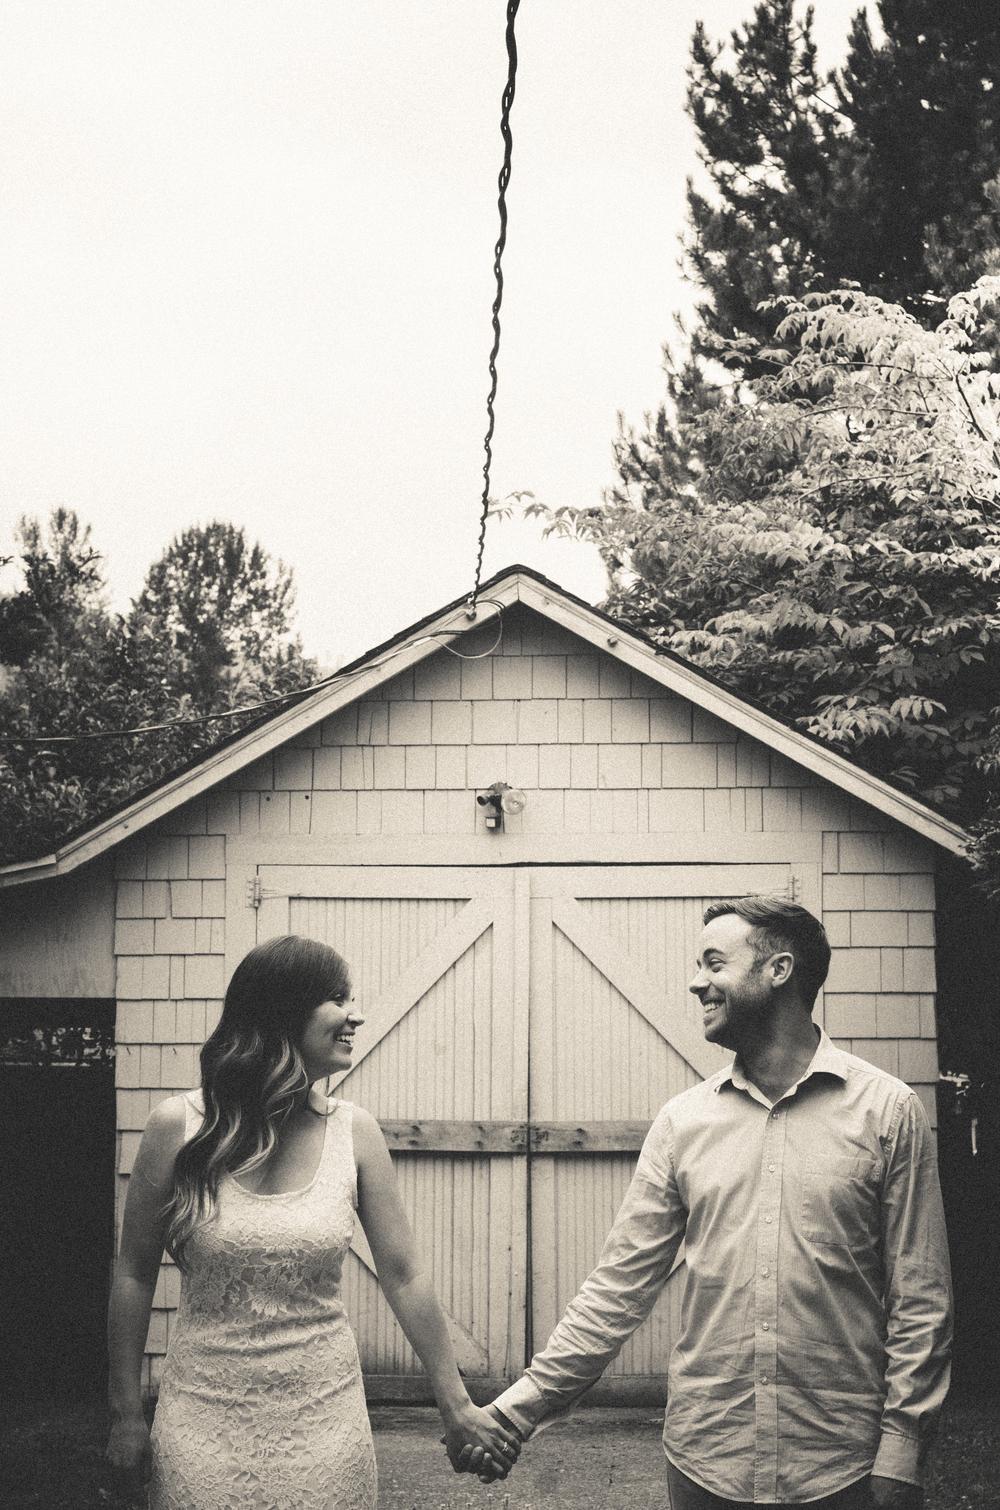 Troy and Jenna-54.jpg